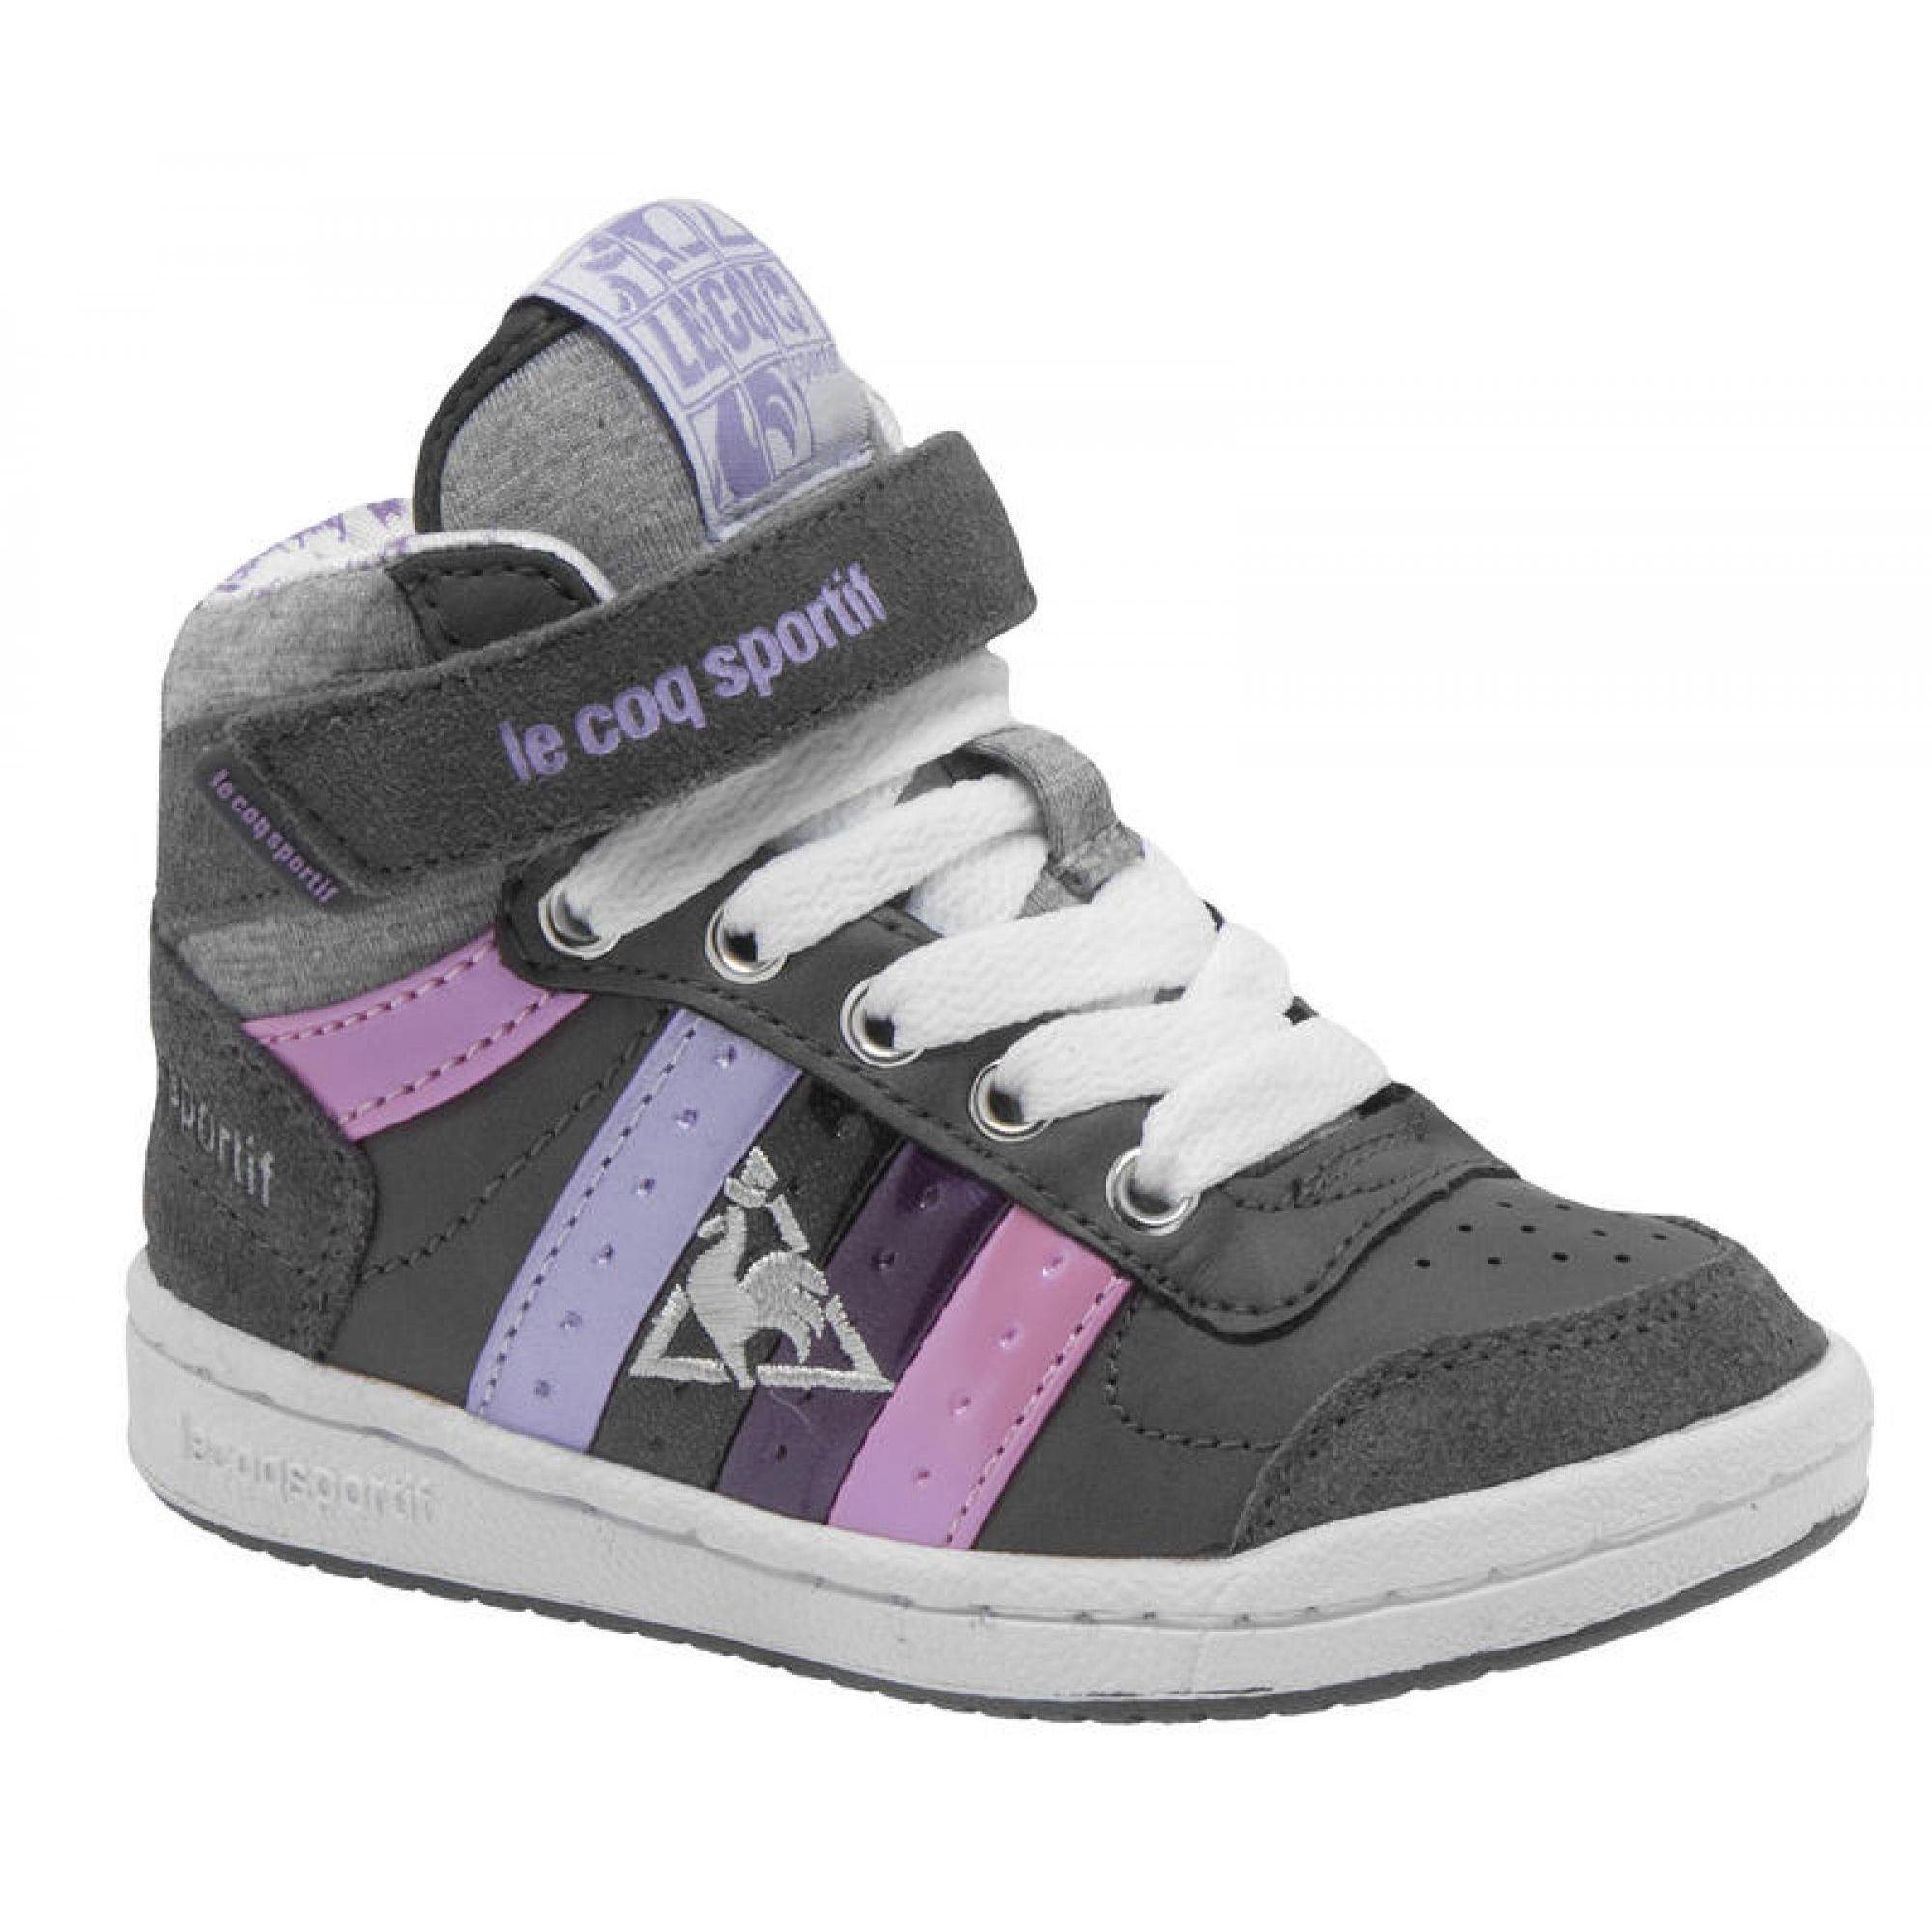 Gave Le coq sportif le coq sportif online shop bailie sneakers peuter (Donkergrey) Sneakers van het merk Le coq sportif. Uitgevoerd in d.grey.